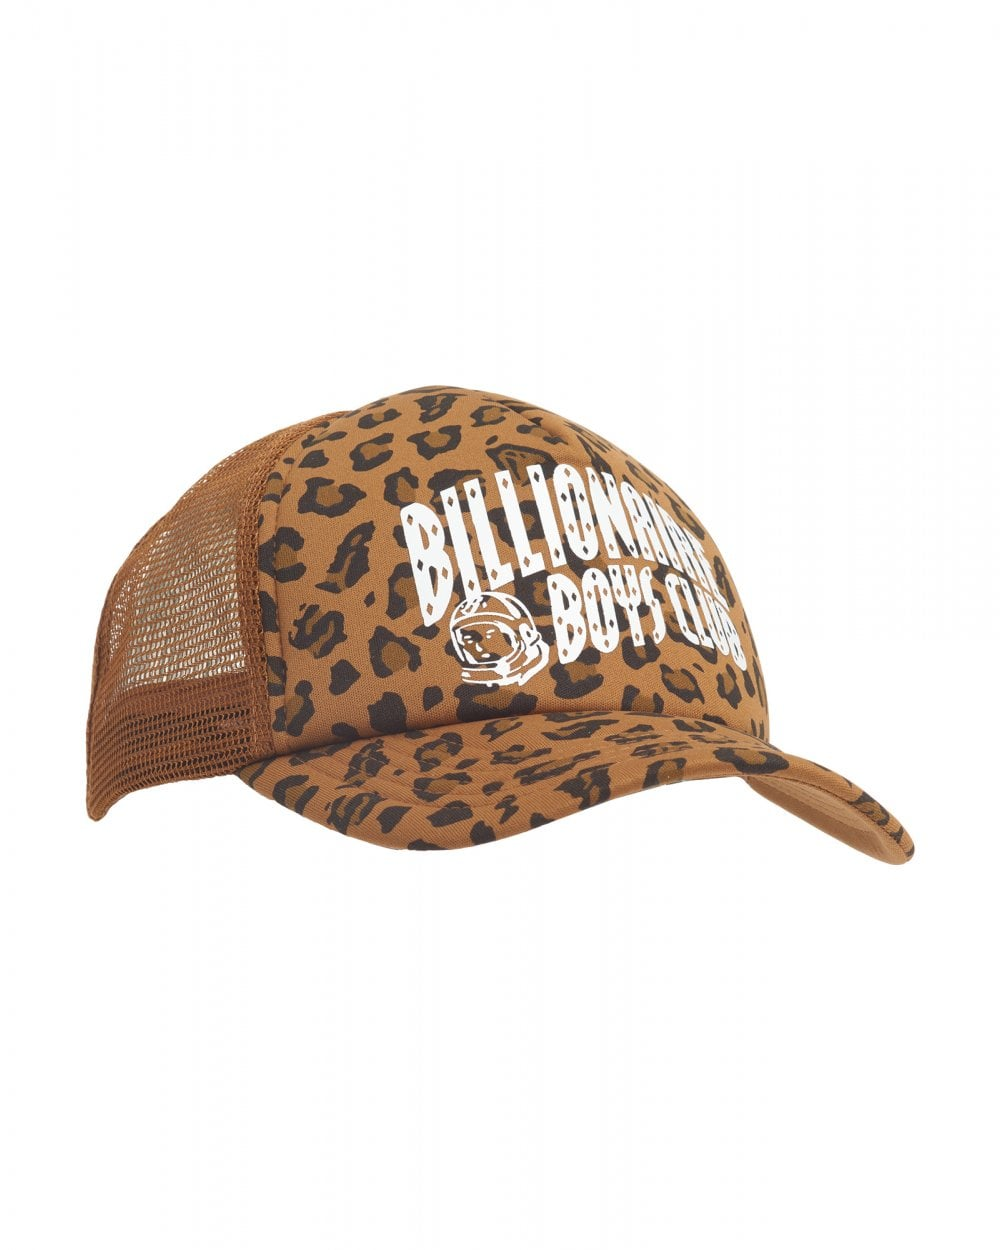 4dc61f53786 Billionaire Boys Club Mens Leopard Print Trucker Cap